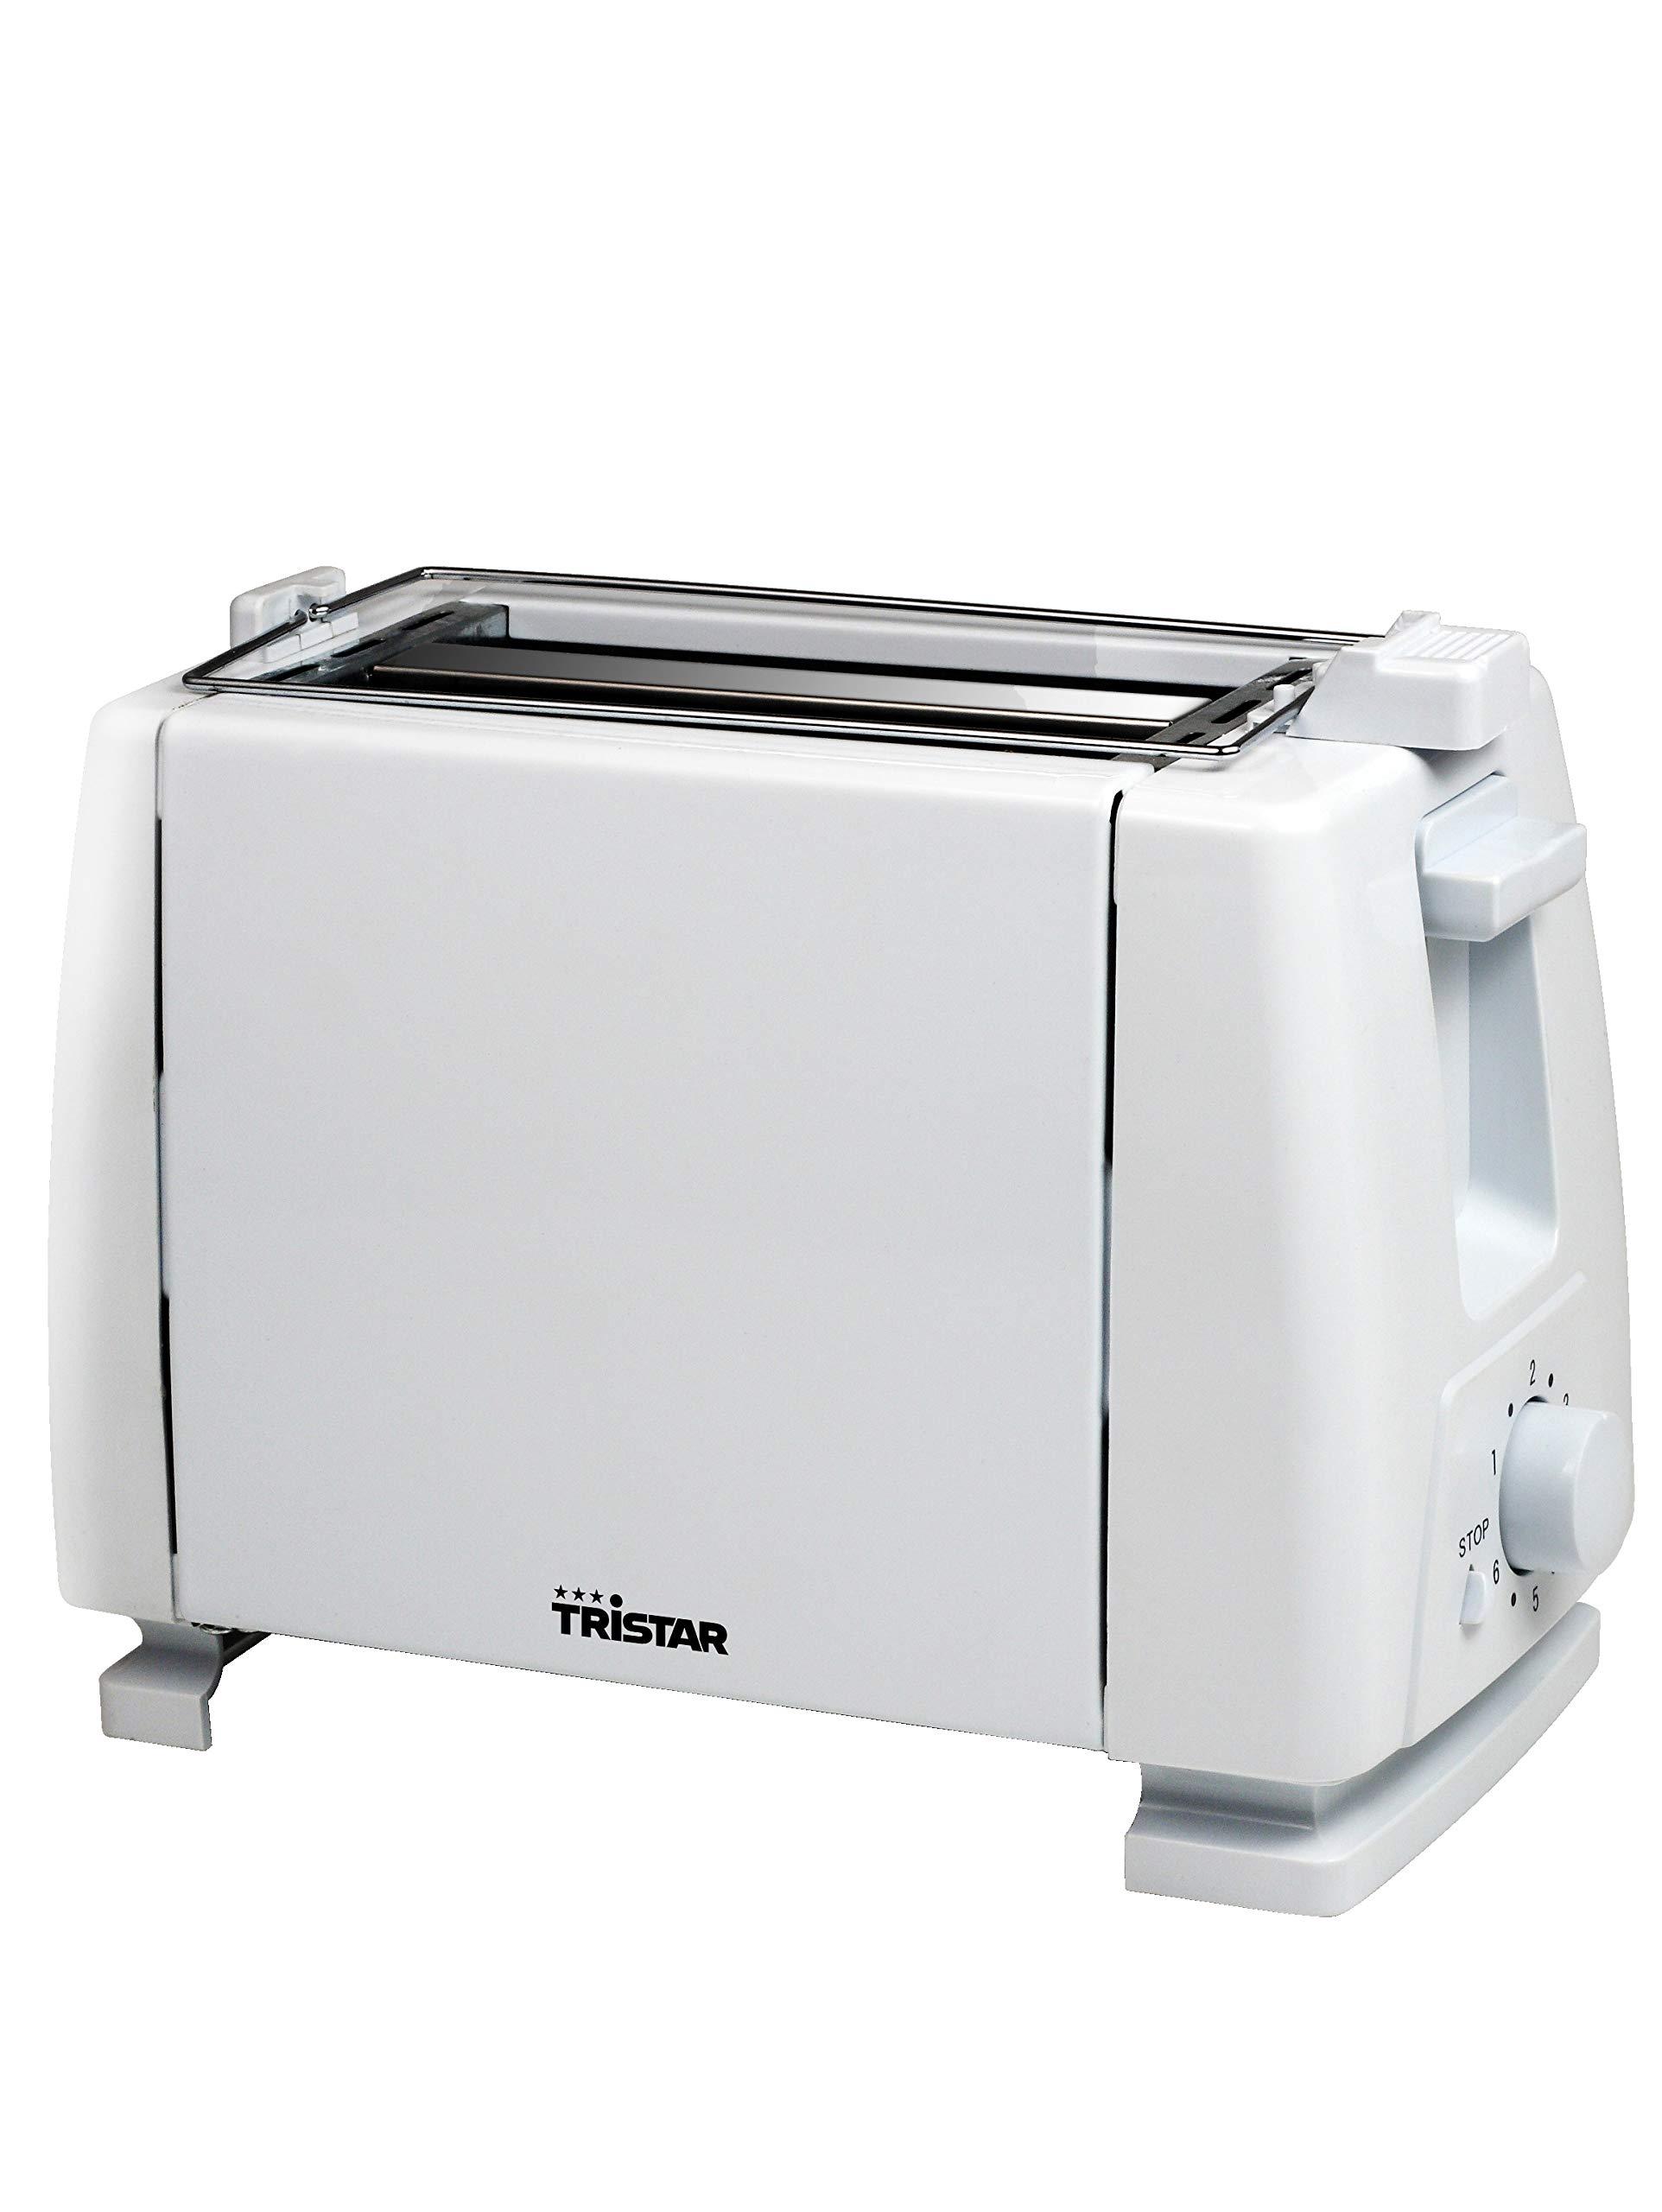 Tristar-Tristar-Toaster-BR-1009-Weiss